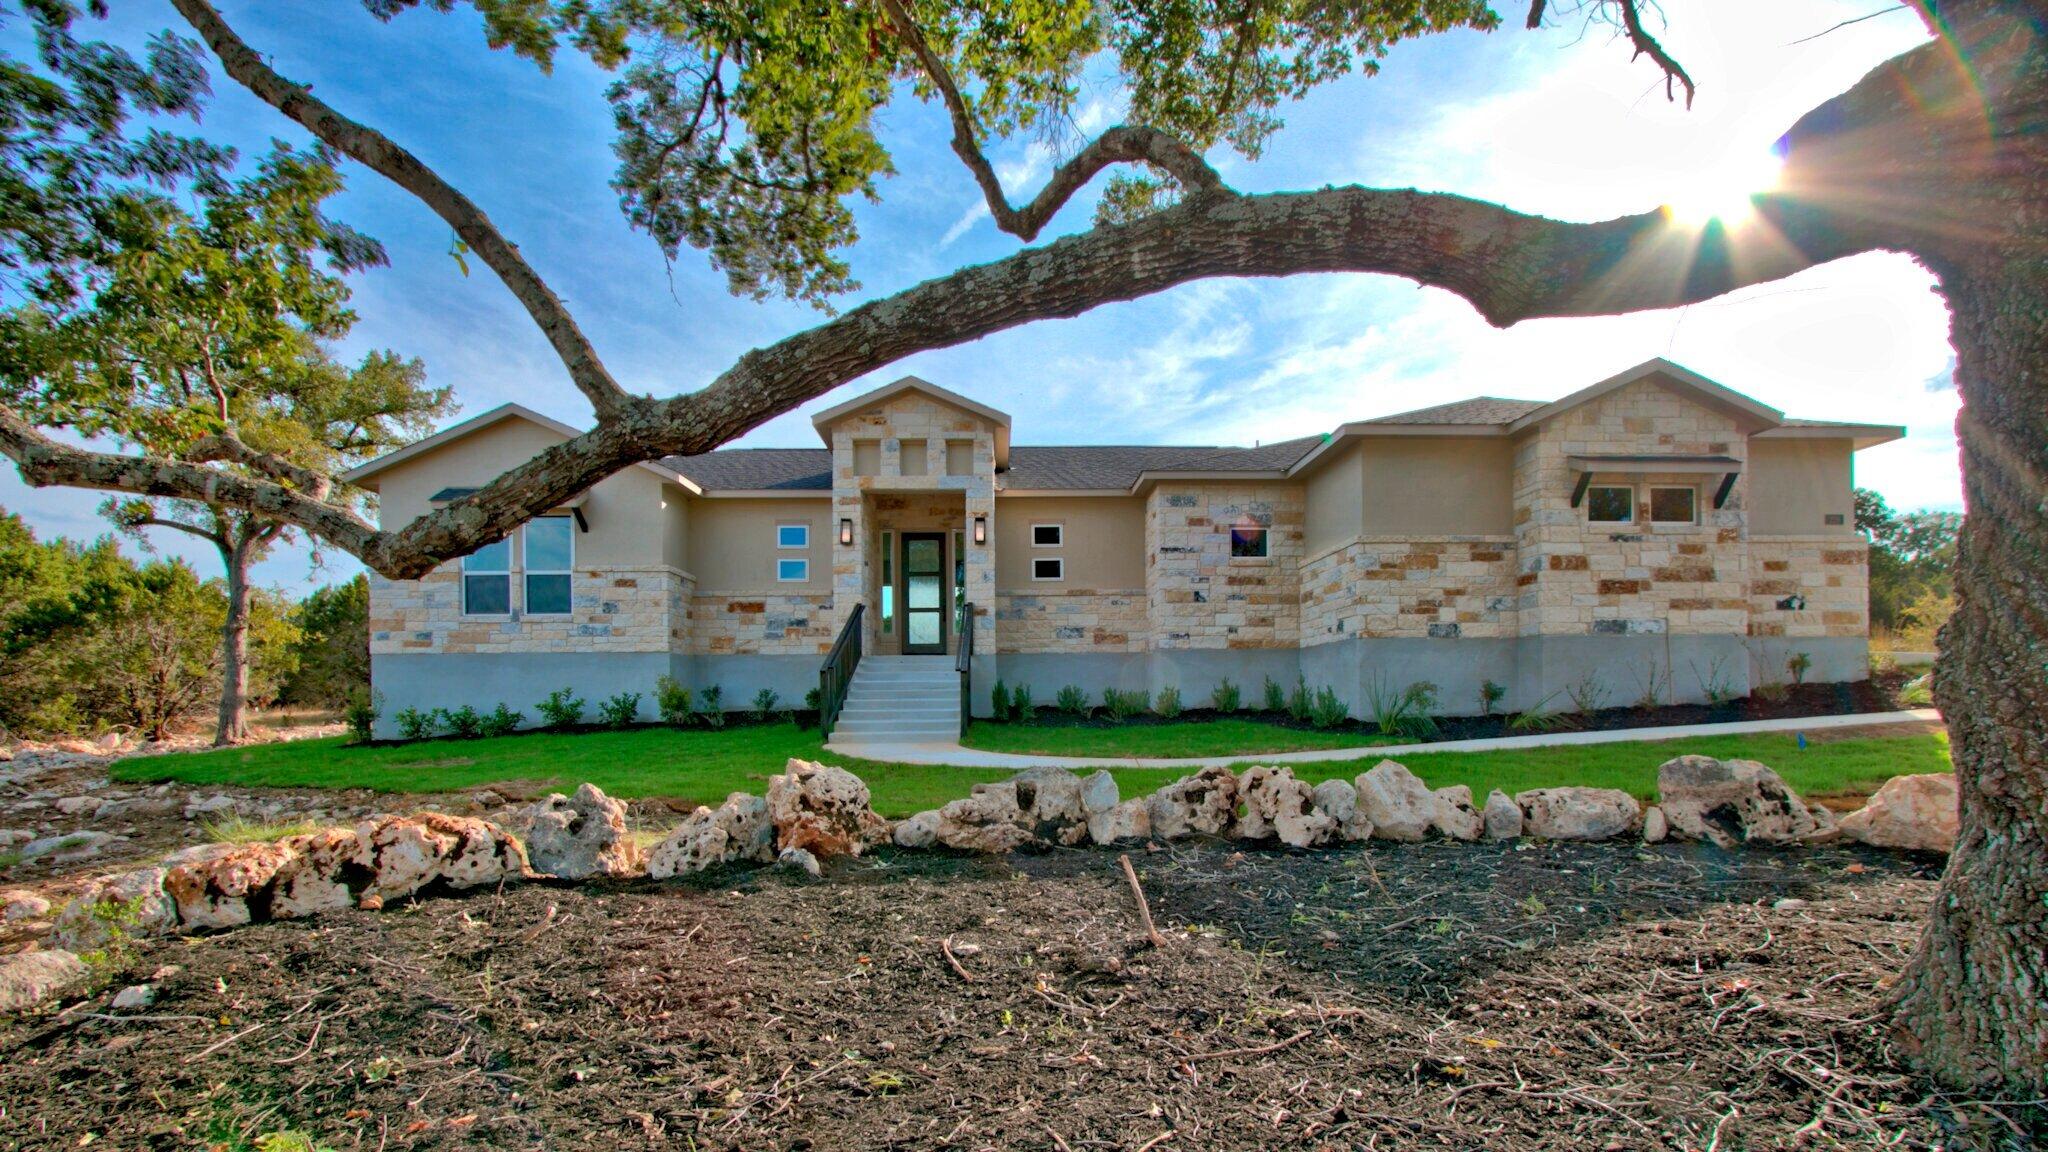 228 High Point Circle - Spring Branch, TX 78070$384,900